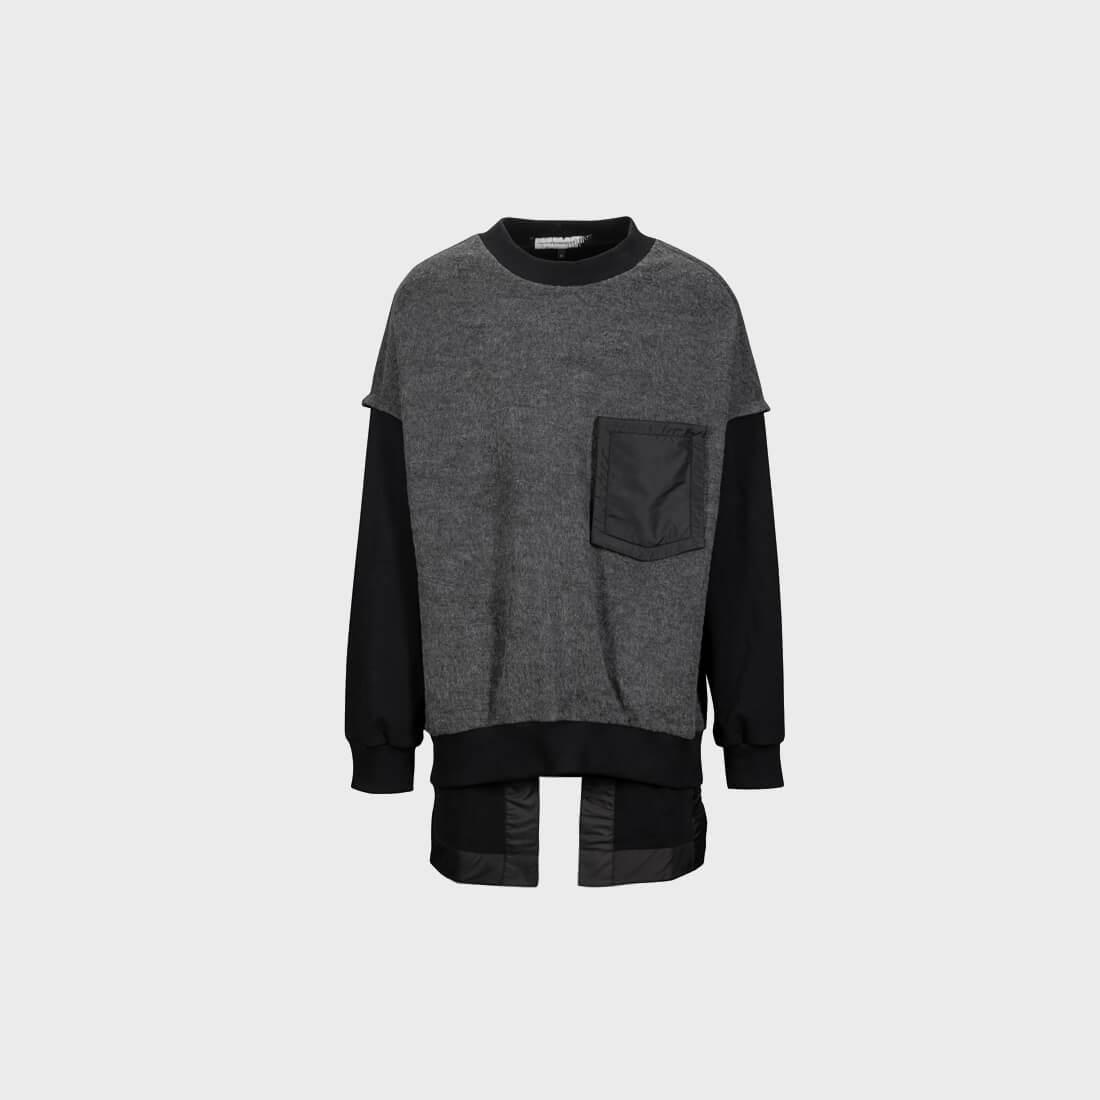 SOSNOVSKA Wrong Cut Bottom Sweatshirt